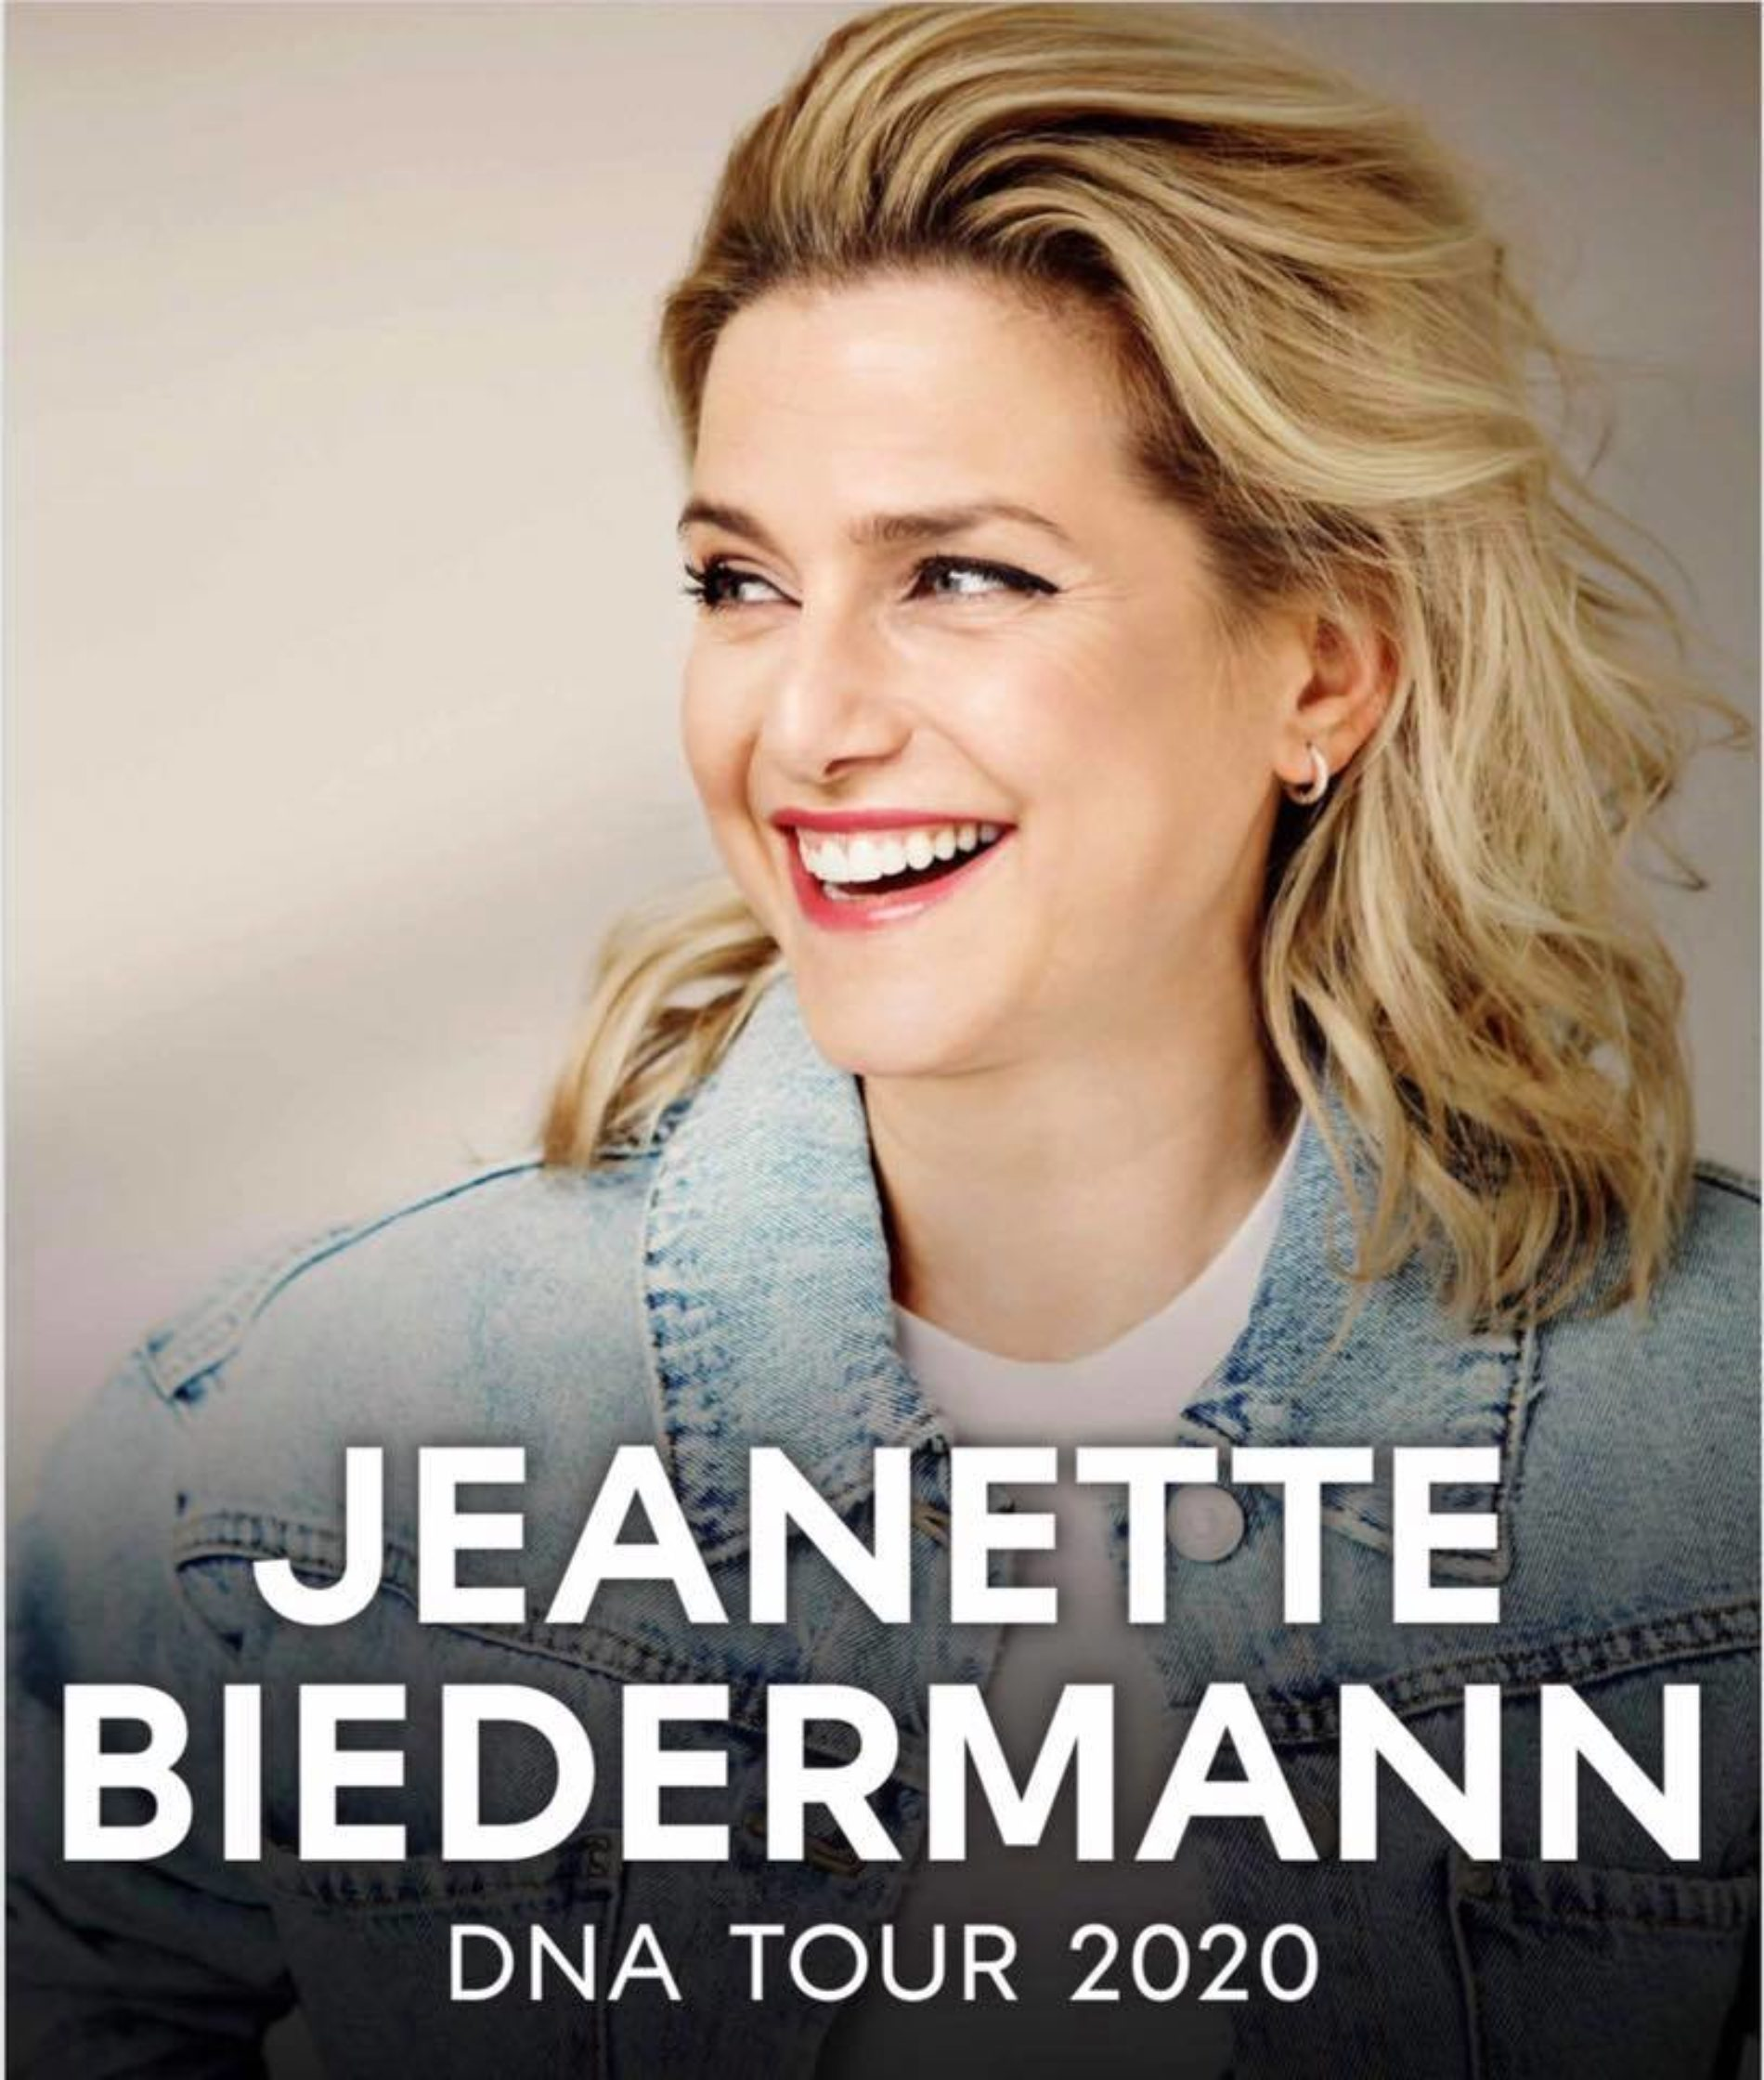 Jeanette Biedermann – DNA Tour 2020